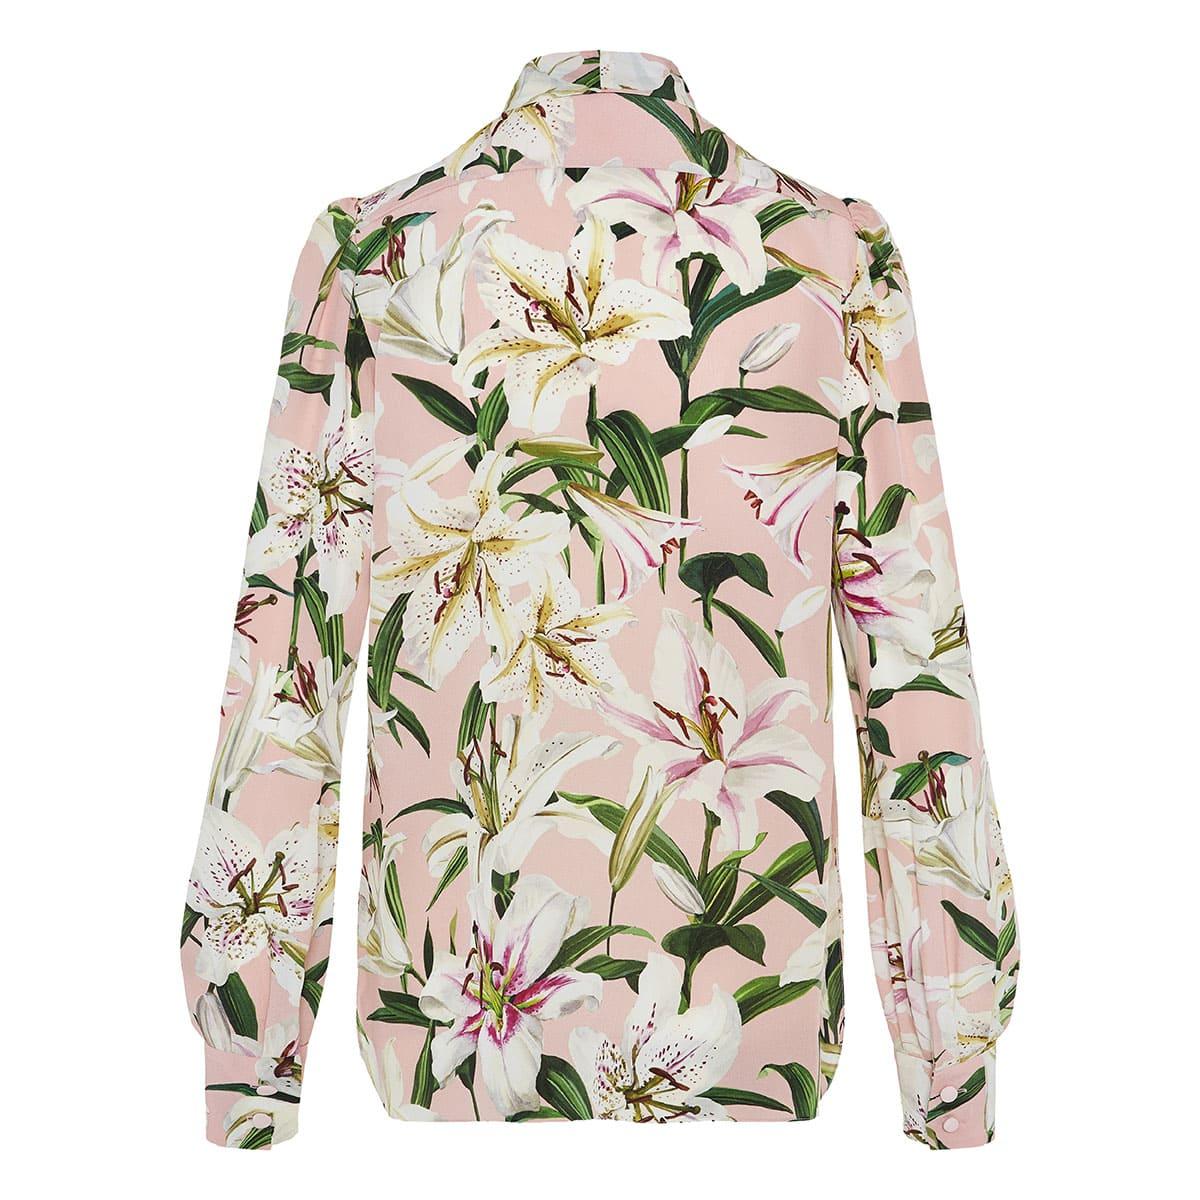 Bow-tie lily-print shirt